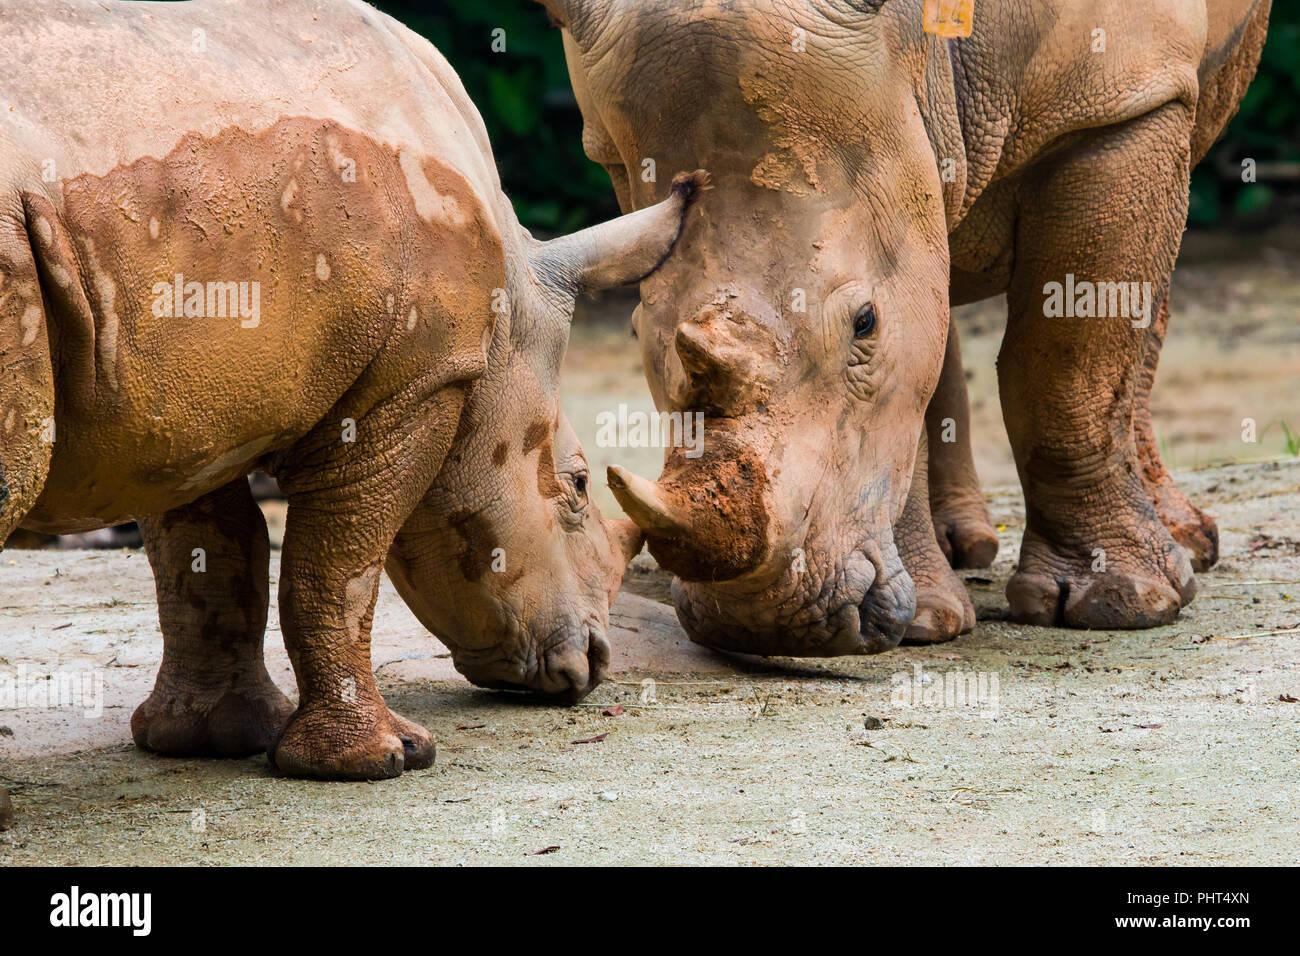 White Rhinos - Stock Image